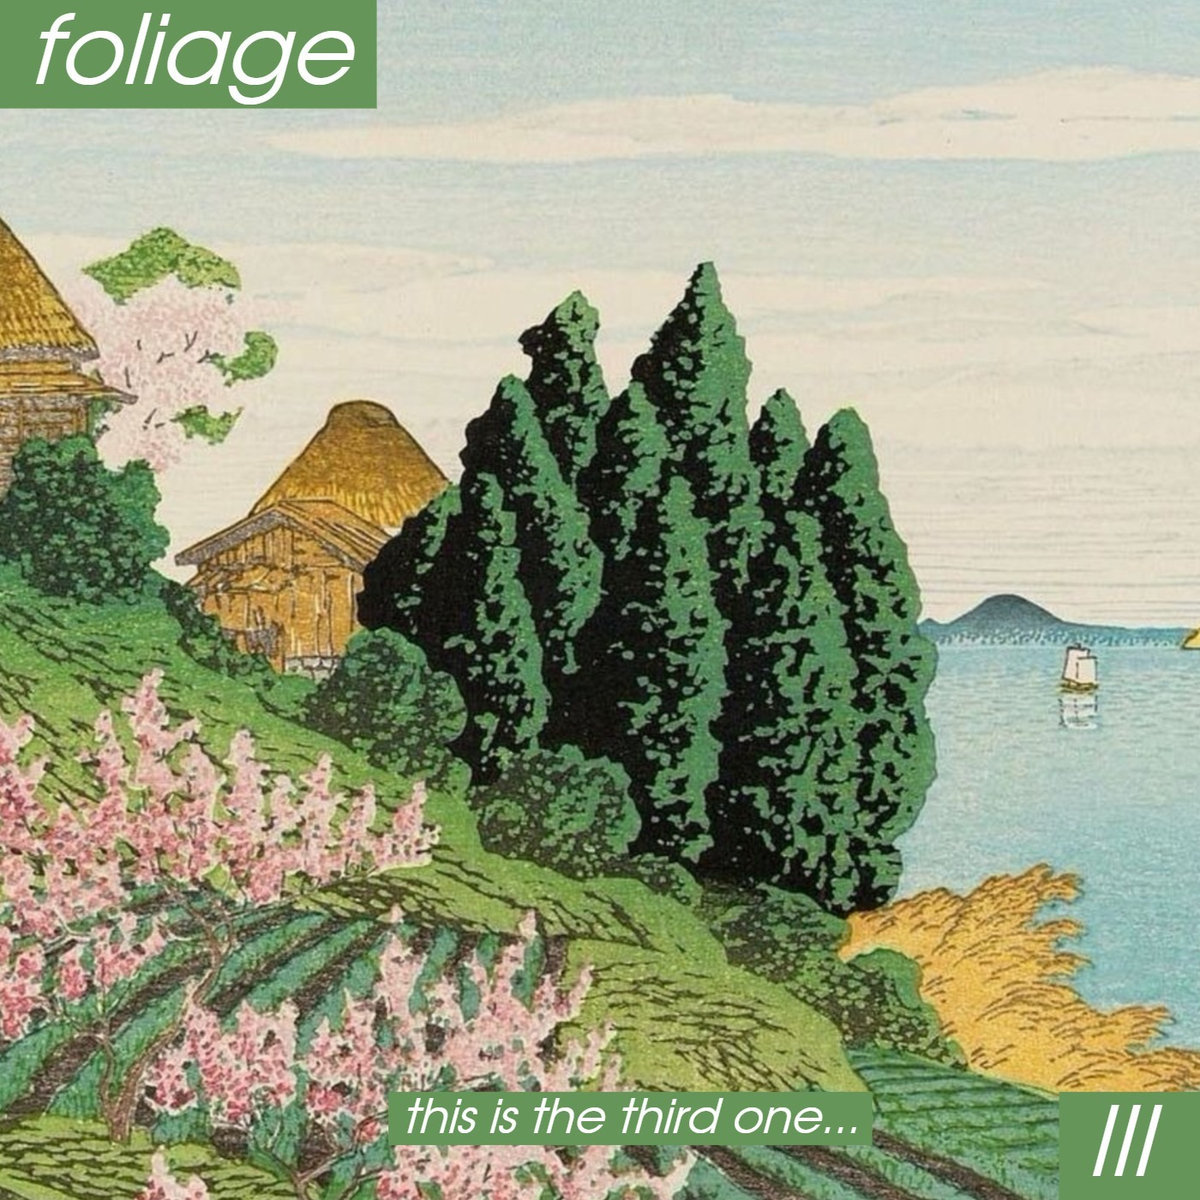 Foliage /  III(100 Ltd CD / Cassette)